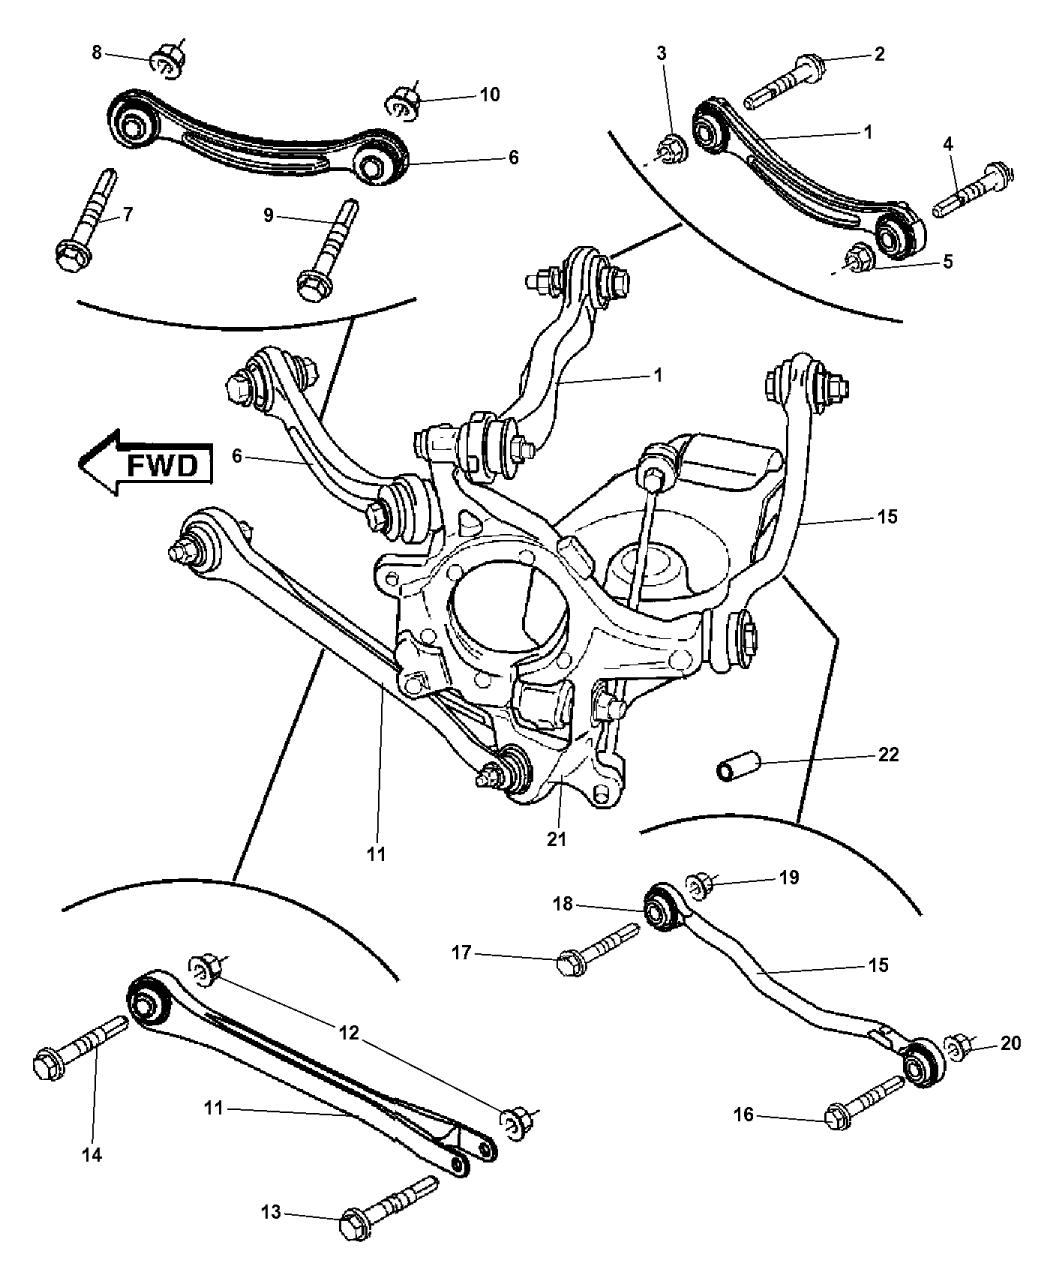 2008 dodge charger engine diagram 4782586ac genuine mopar knuckle rear  4782586ac genuine mopar knuckle rear